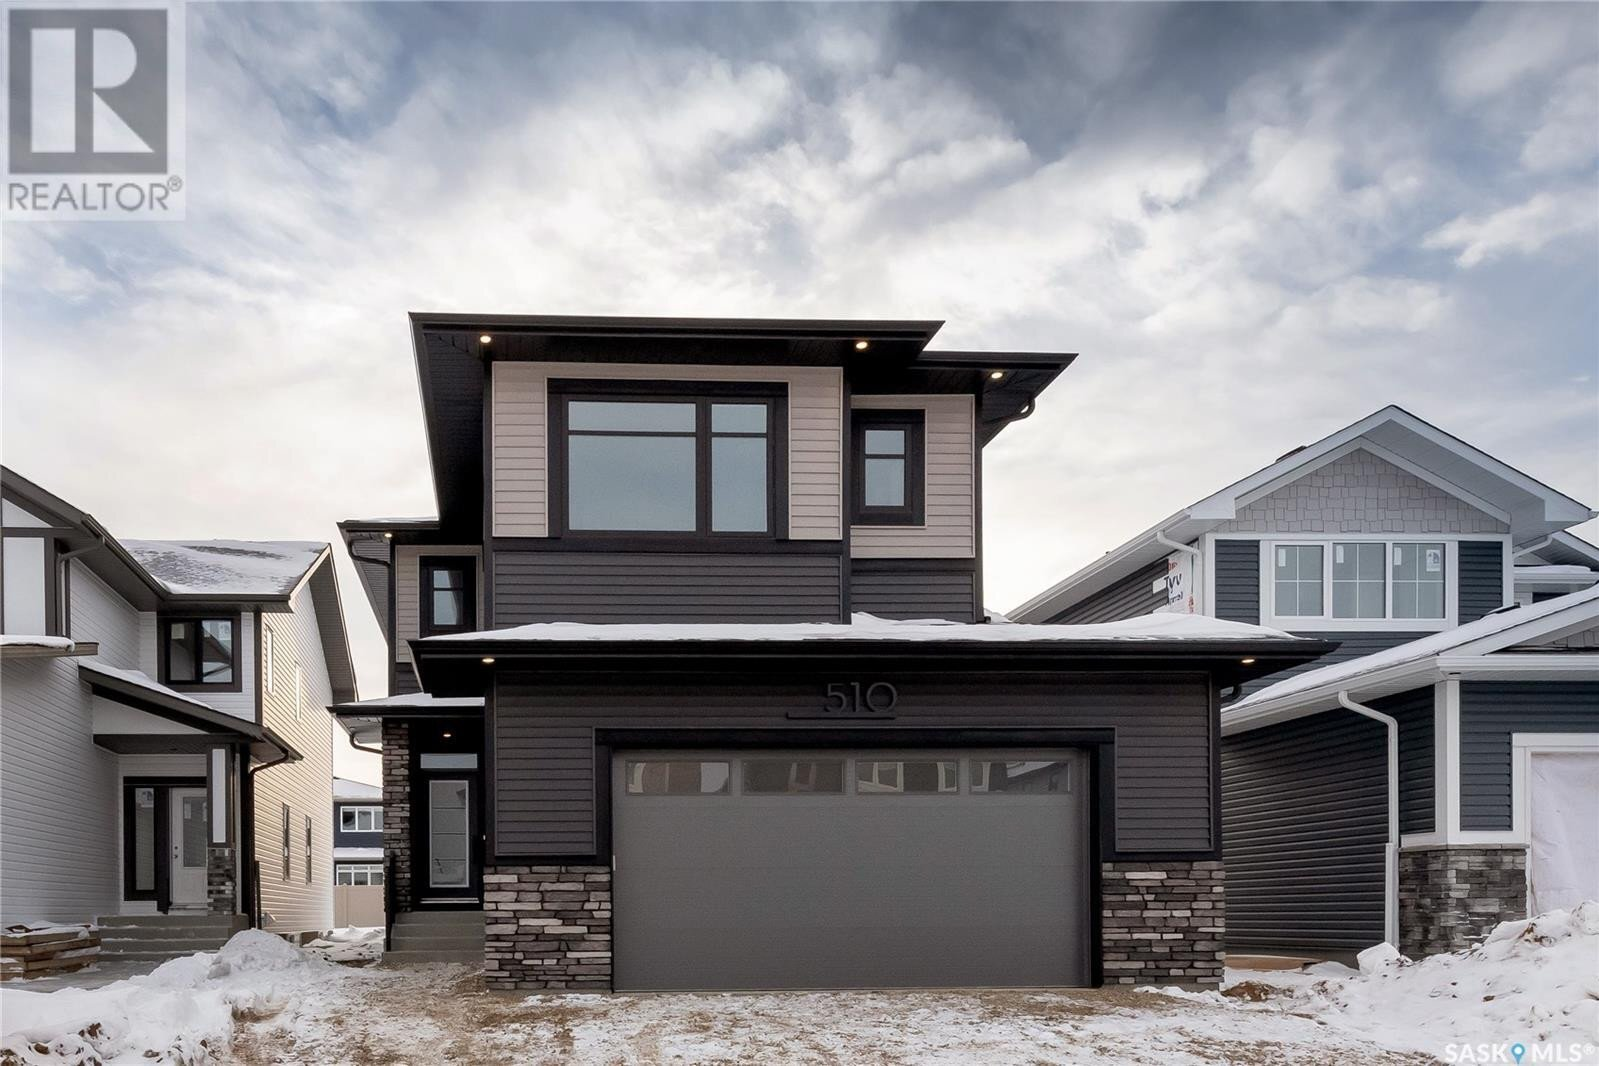 House for sale at 510 Germain Wy Saskatoon Saskatchewan - MLS: SK834472